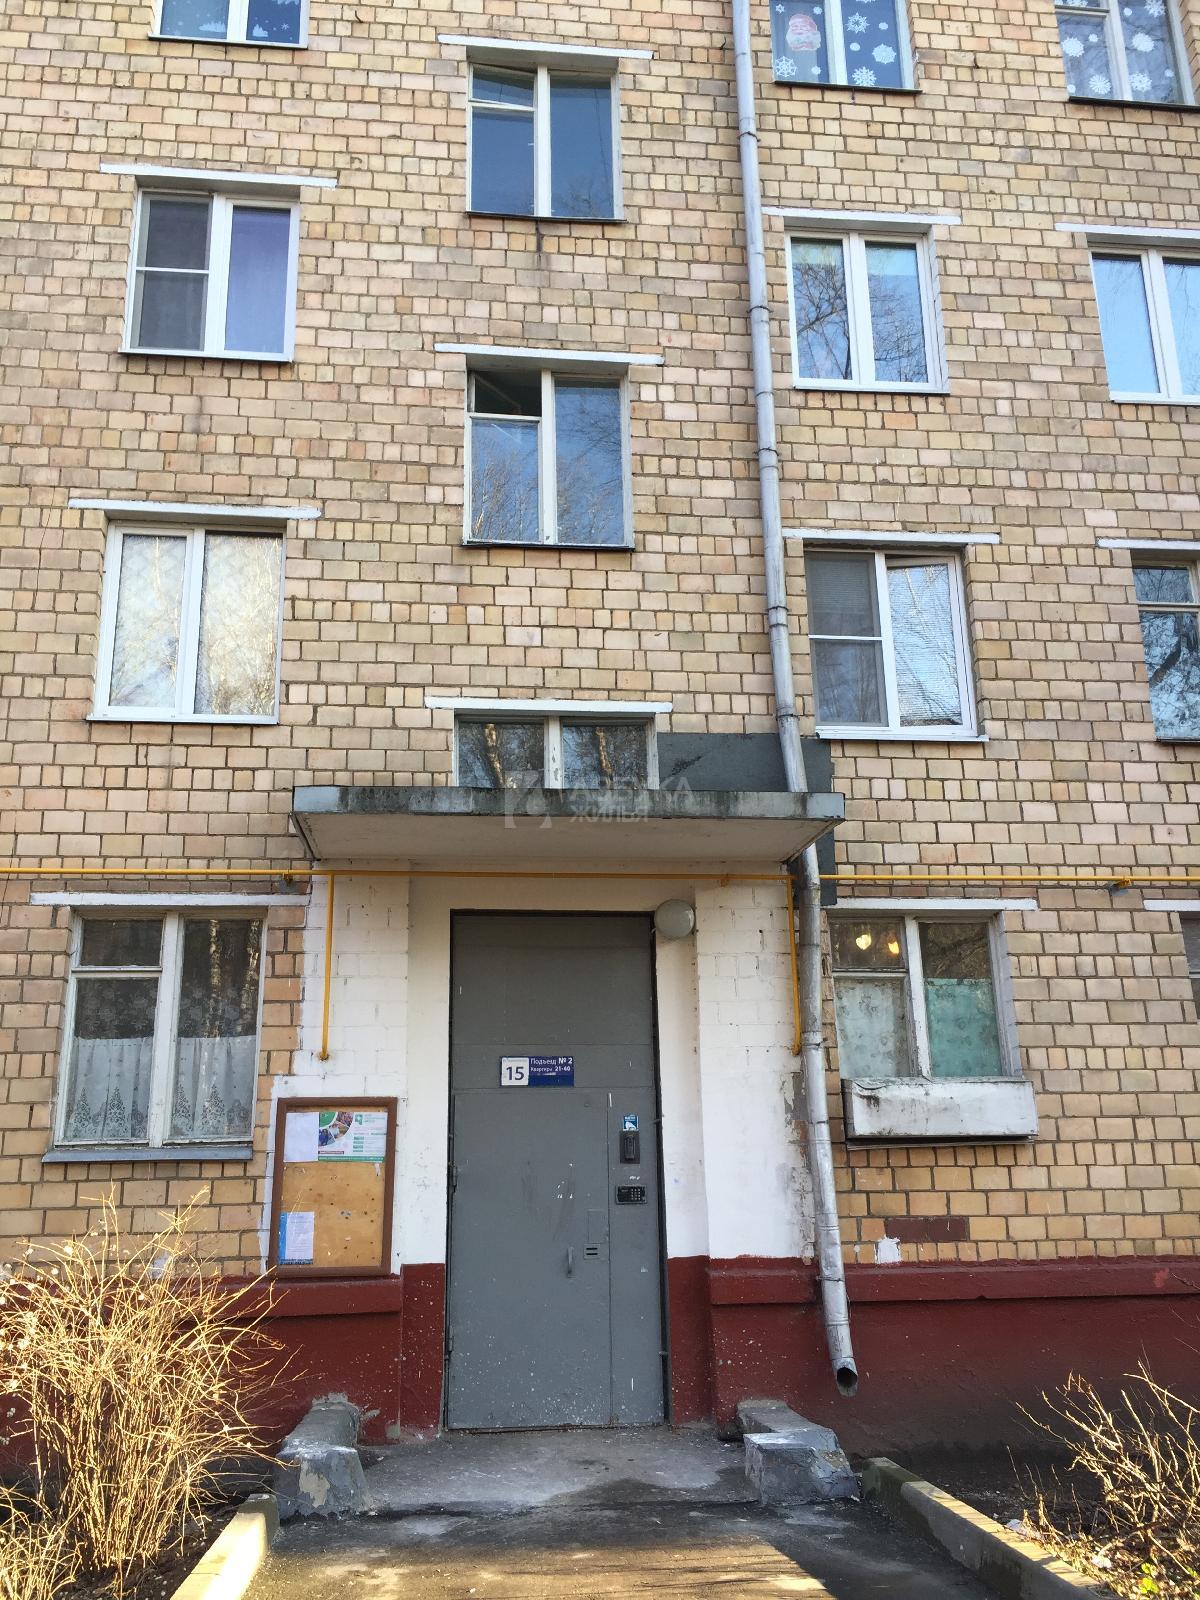 Фото №5 - 3-комнатная квартира, Москва, Криворожская улица 15, метро Нагорная